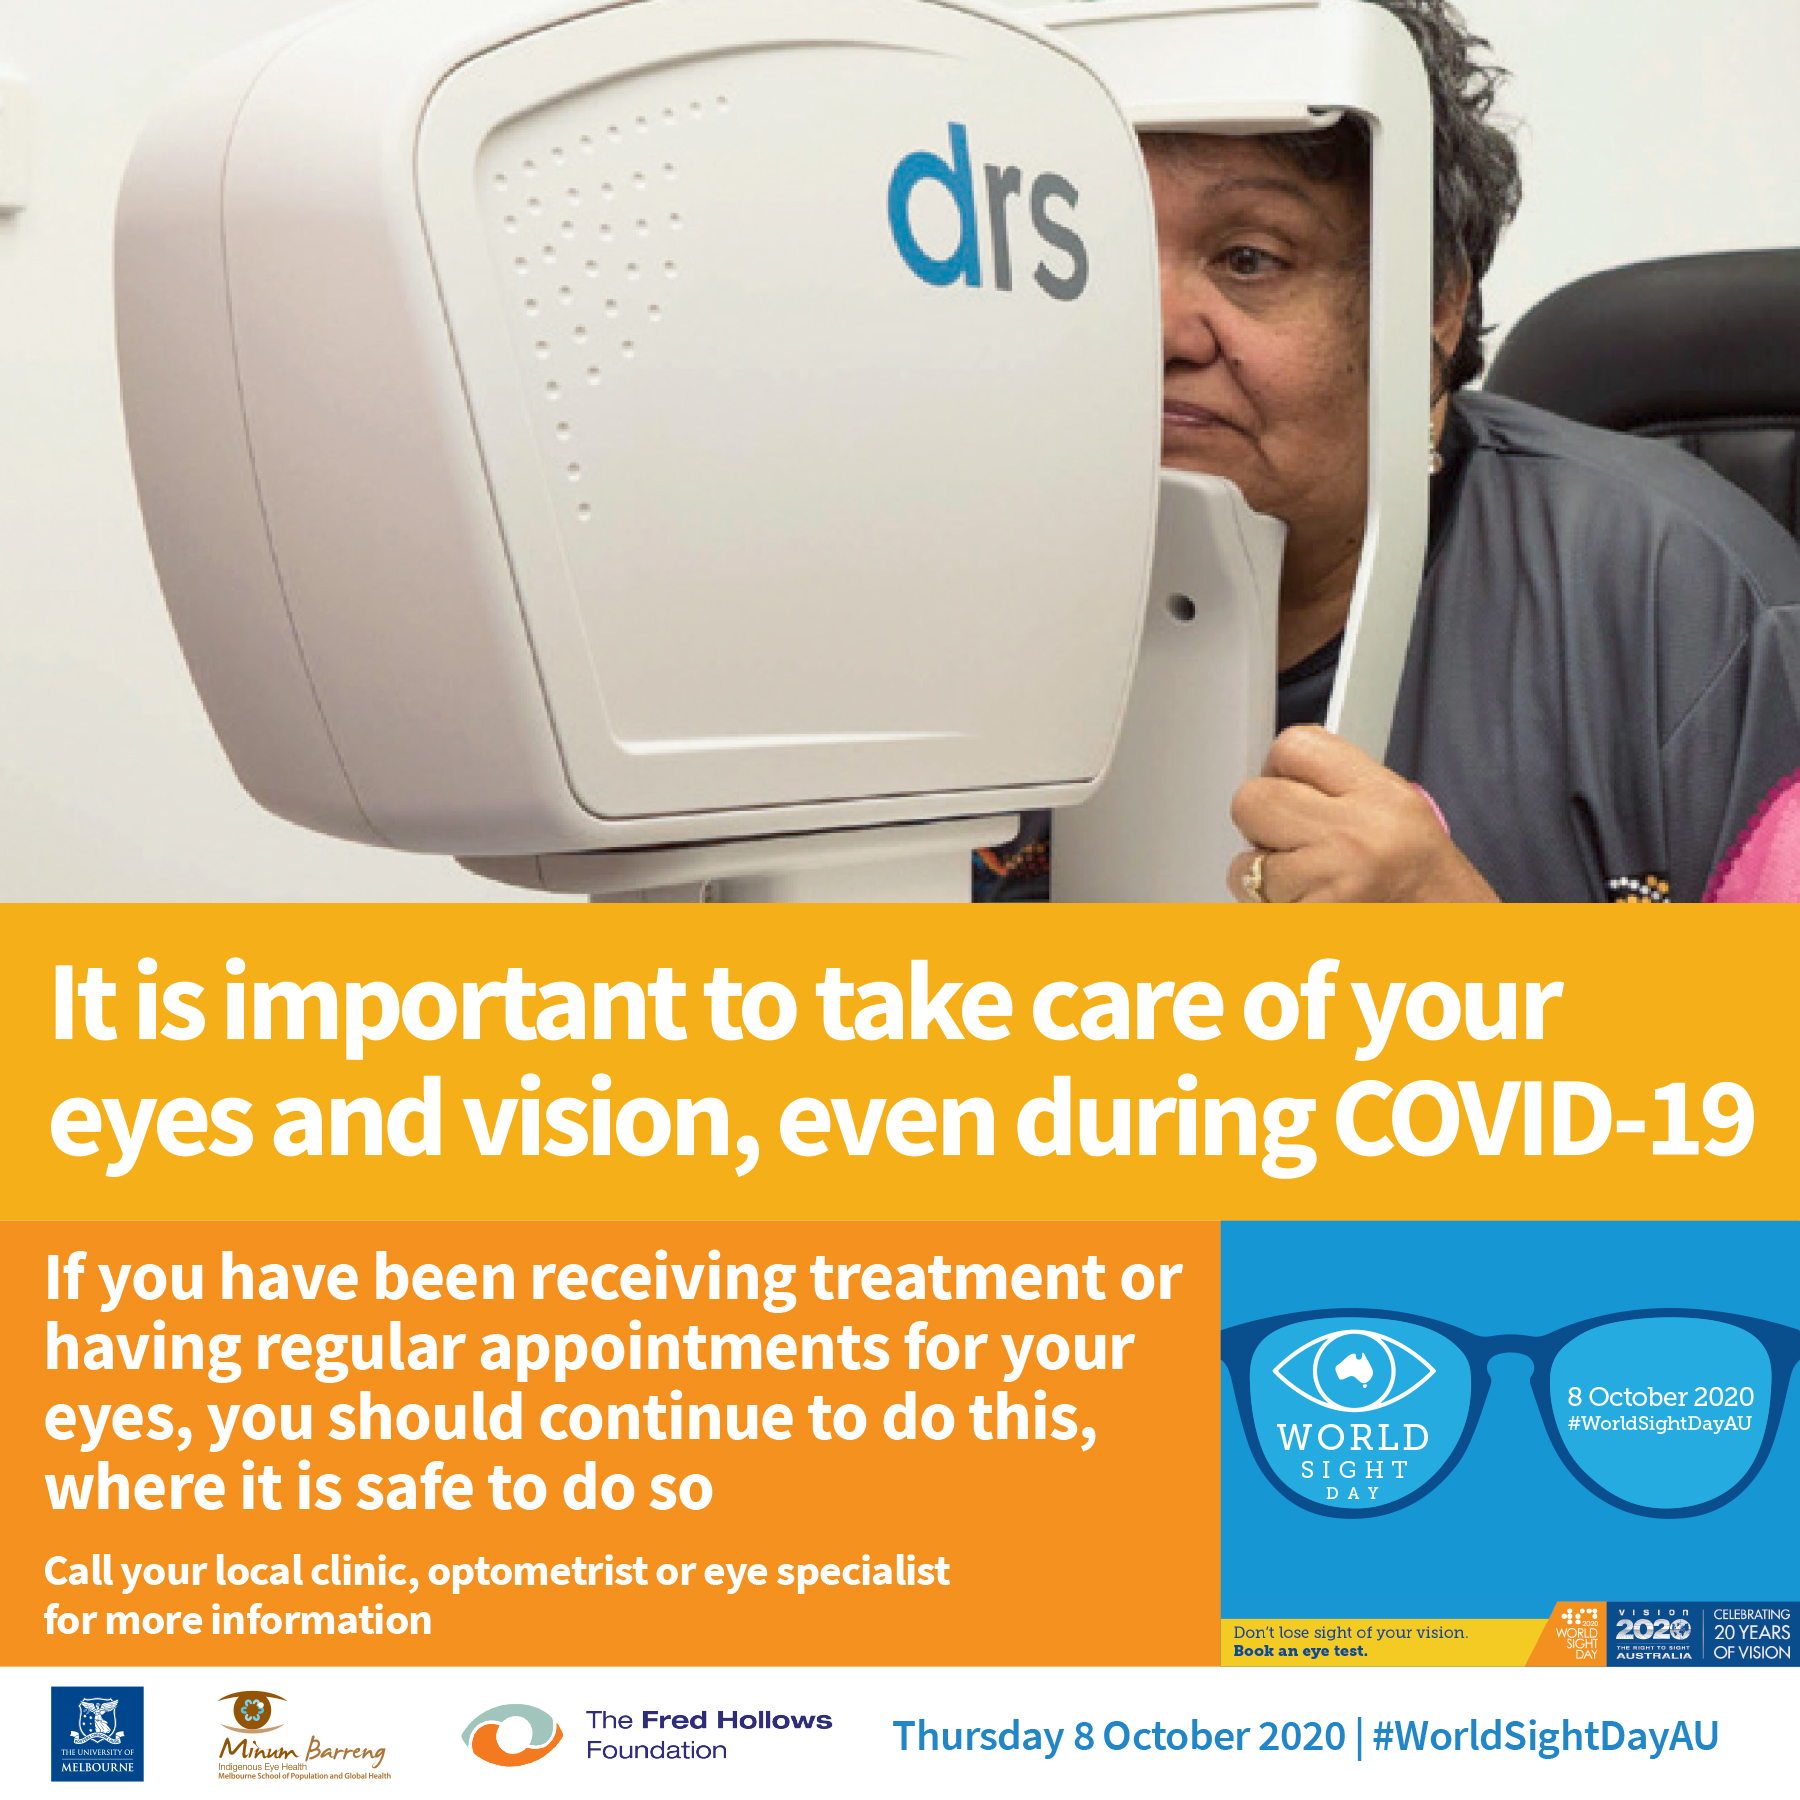 Eye check image promoting world sight day